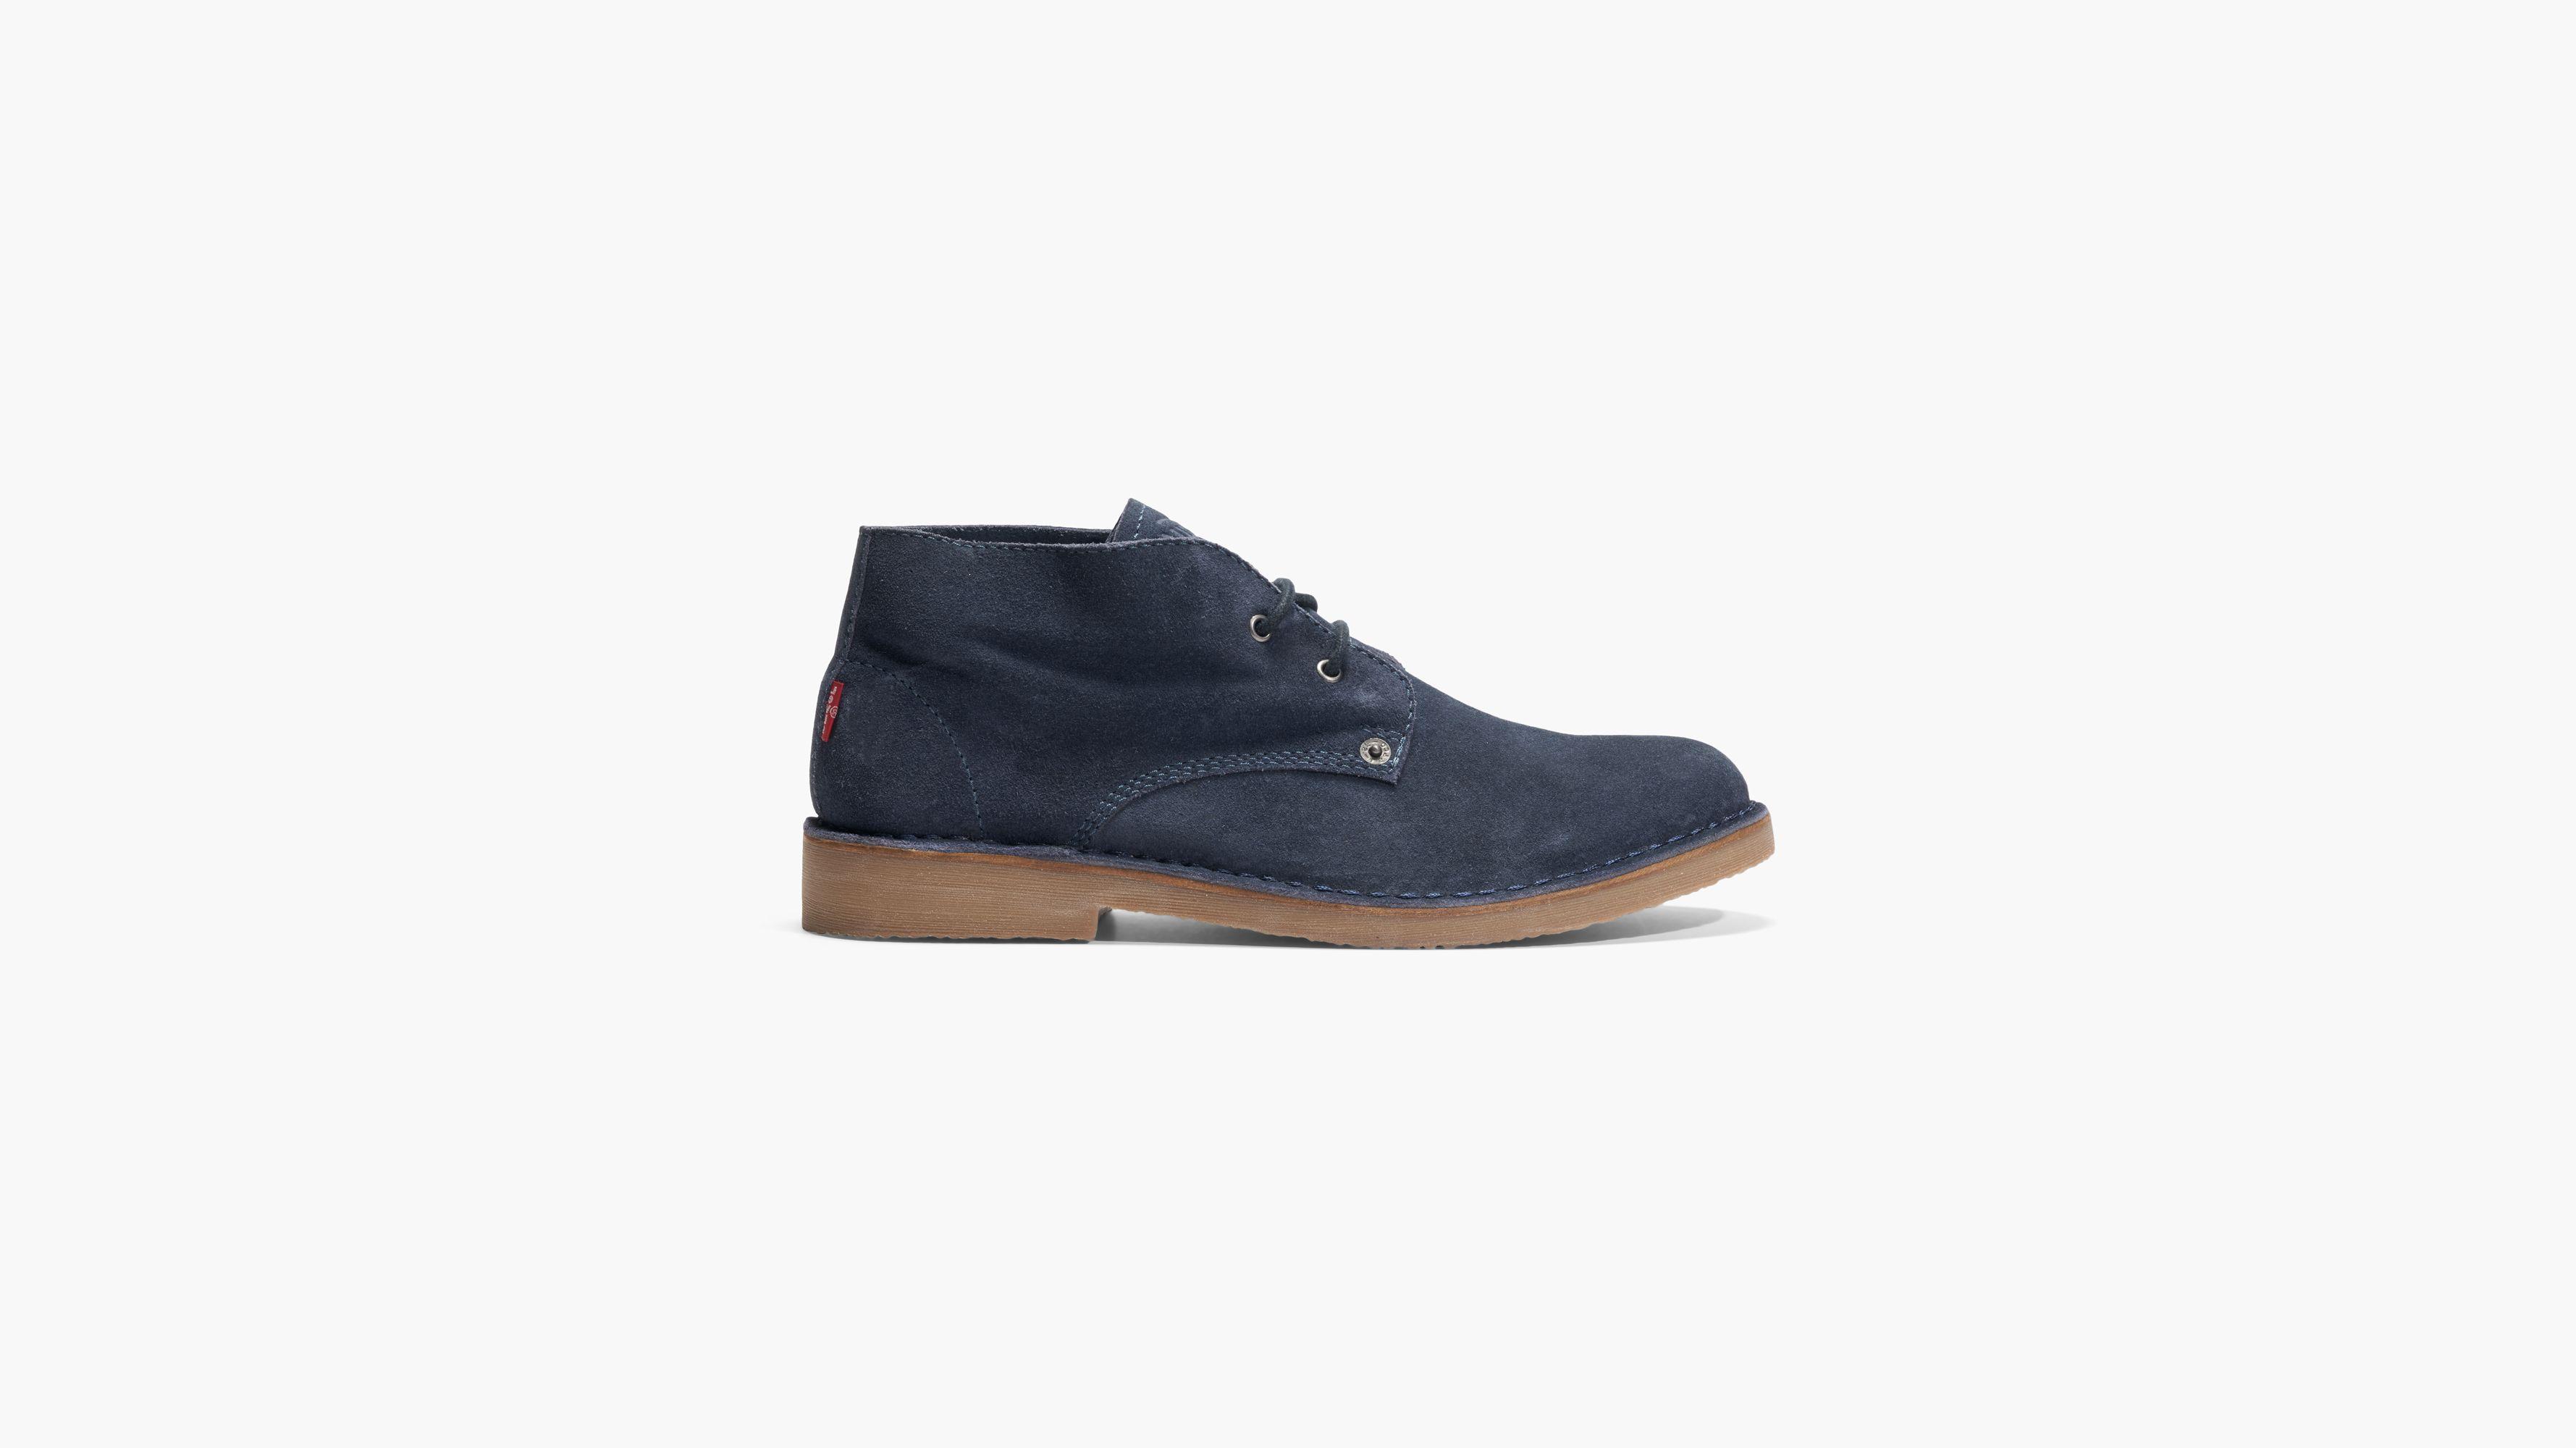 Fr Chaussures Chaussures Fr Fr Fr Chaussures Chaussures HommeLevi's® Chaussures HommeLevi's® HommeLevi's® HommeLevi's® K1cTFlJ